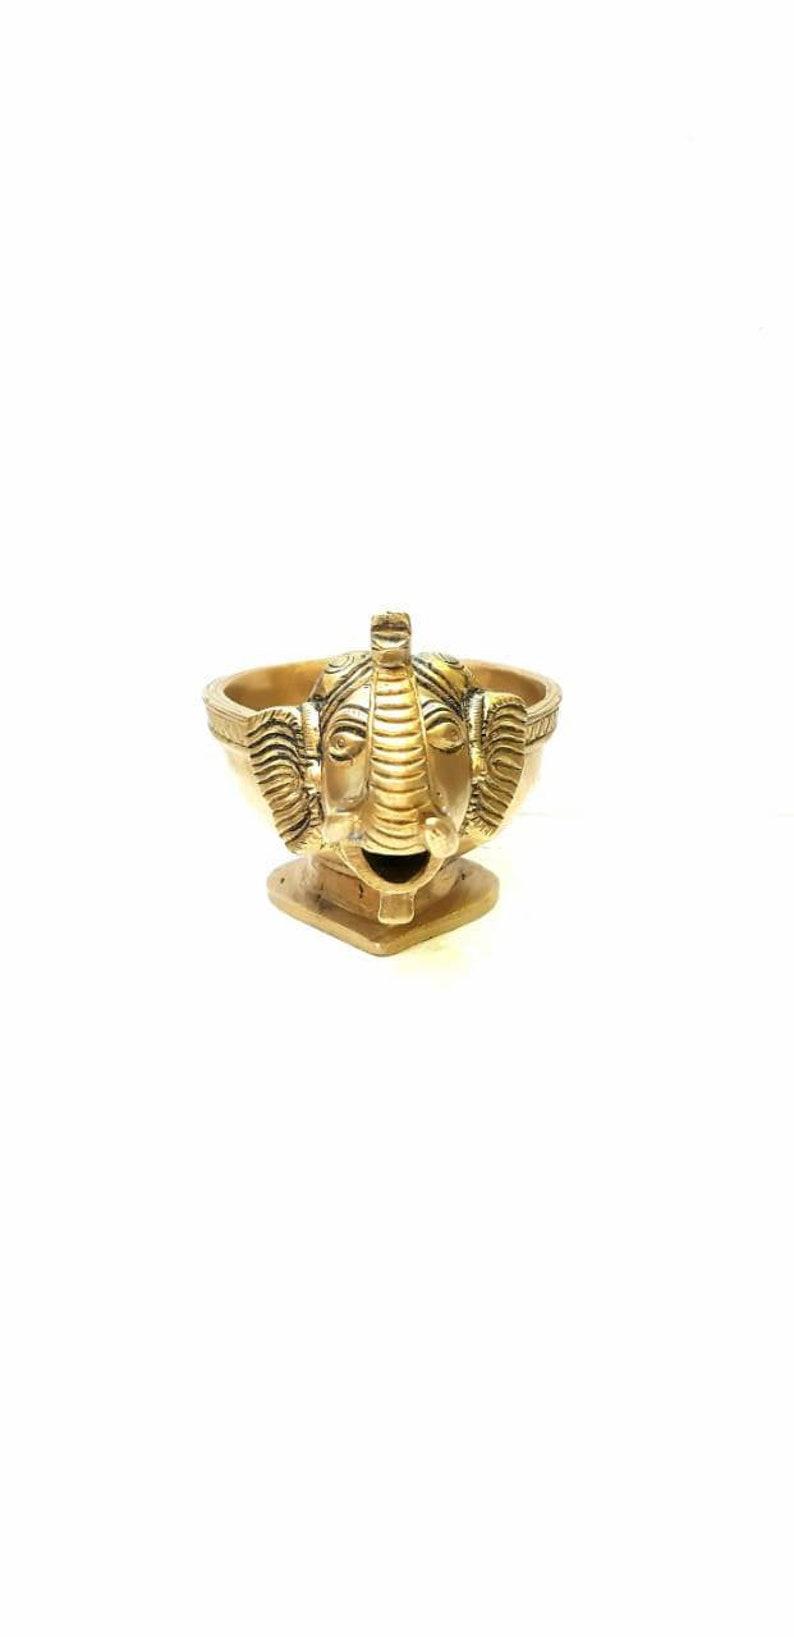 Brass oil diya Elephant oil lamp Indian traditional worship idol oil burner for pooja temple or diwali decor incense holder